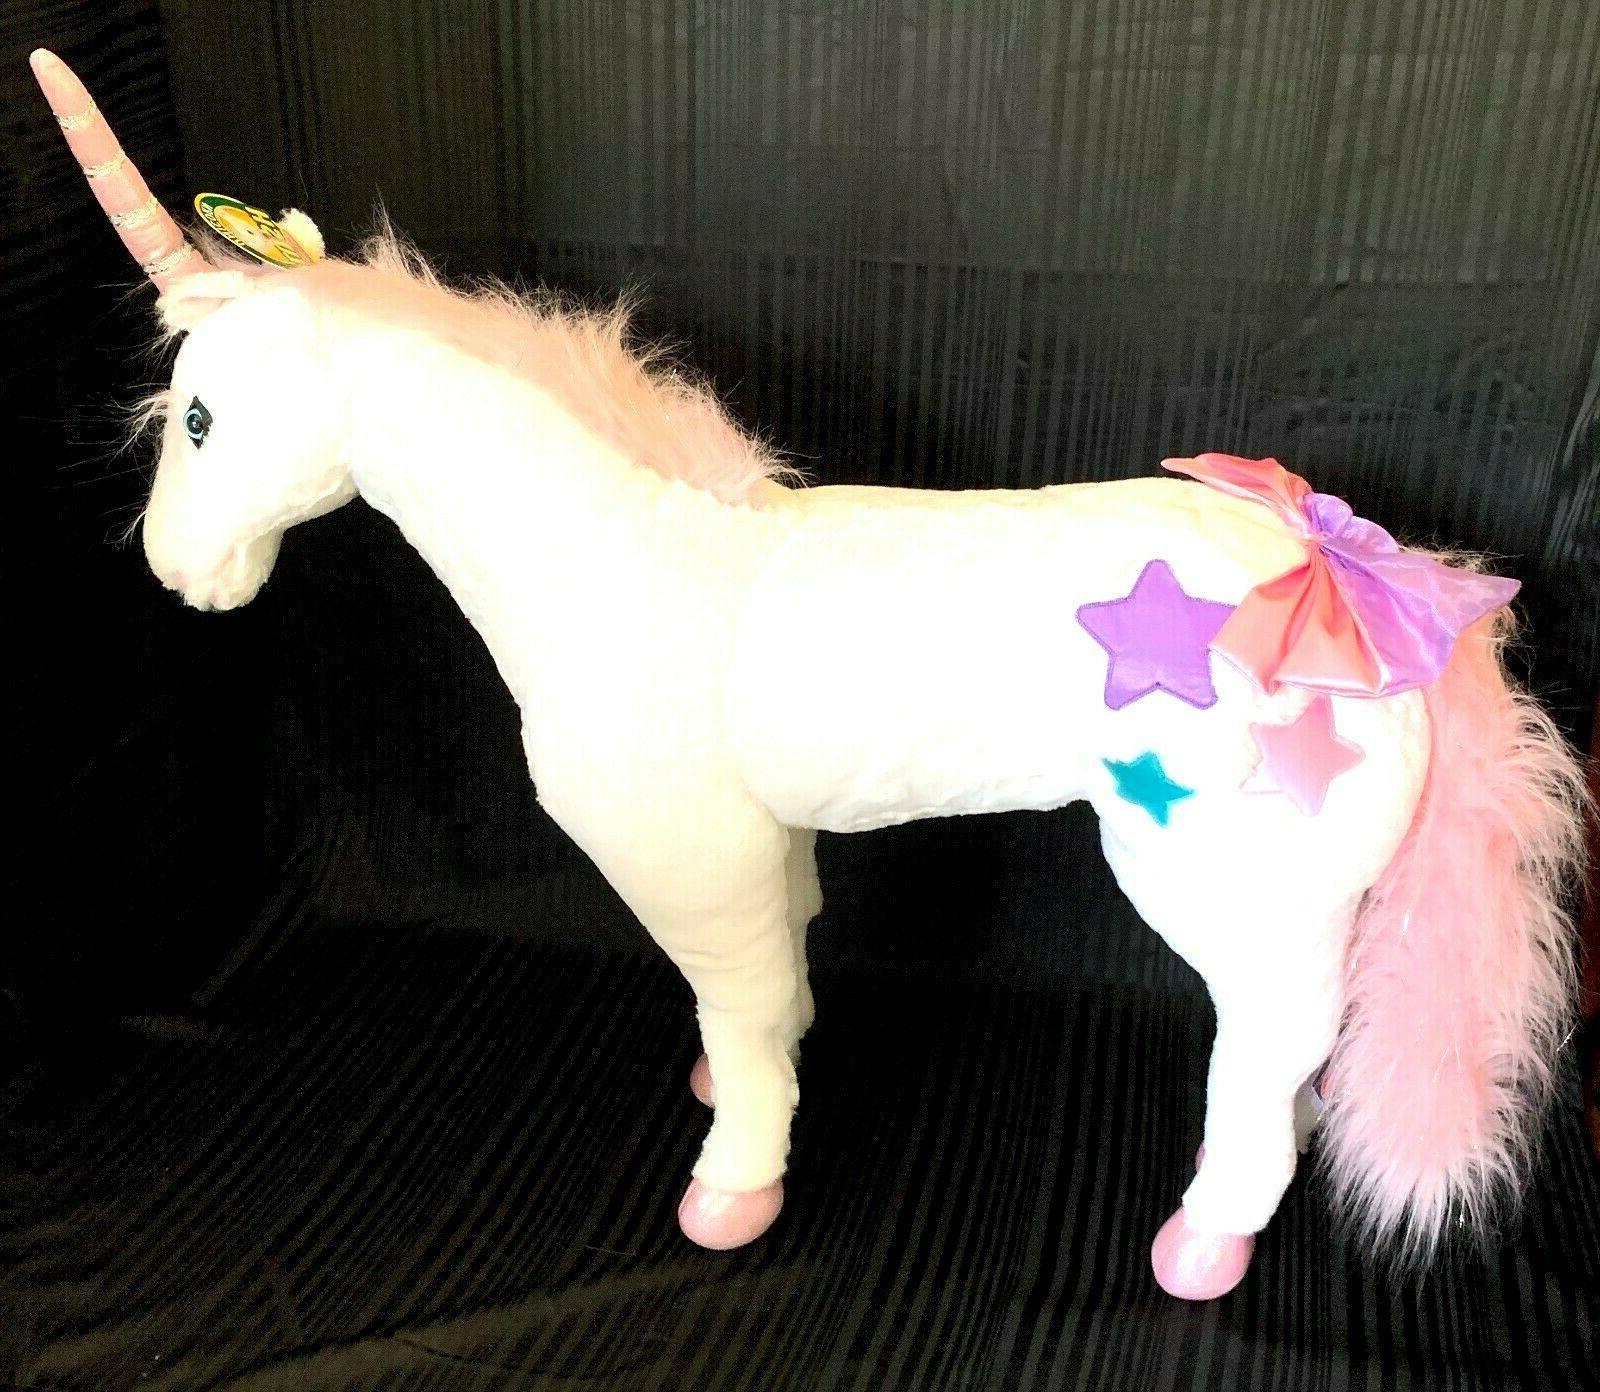 Melissa & Doug Giant Unicorn, Stuffed Animals & Play Toys, S